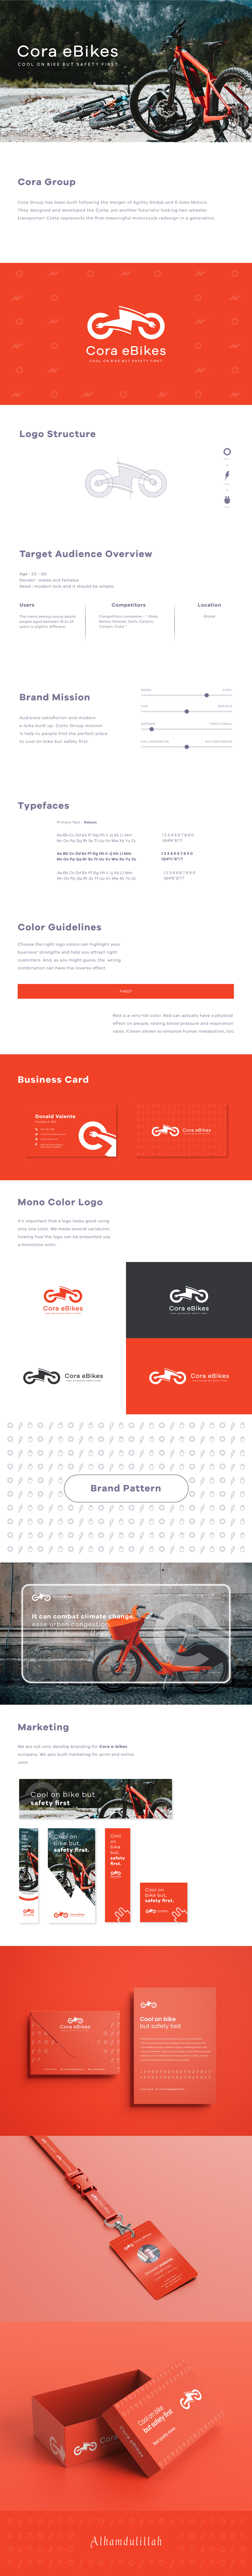 Best brand identity bike Brand Identity Bike Business Card brand identity work branding personal cora e-bikes branding ebike branding Online Product Branding rimonhasand601 School brand identity